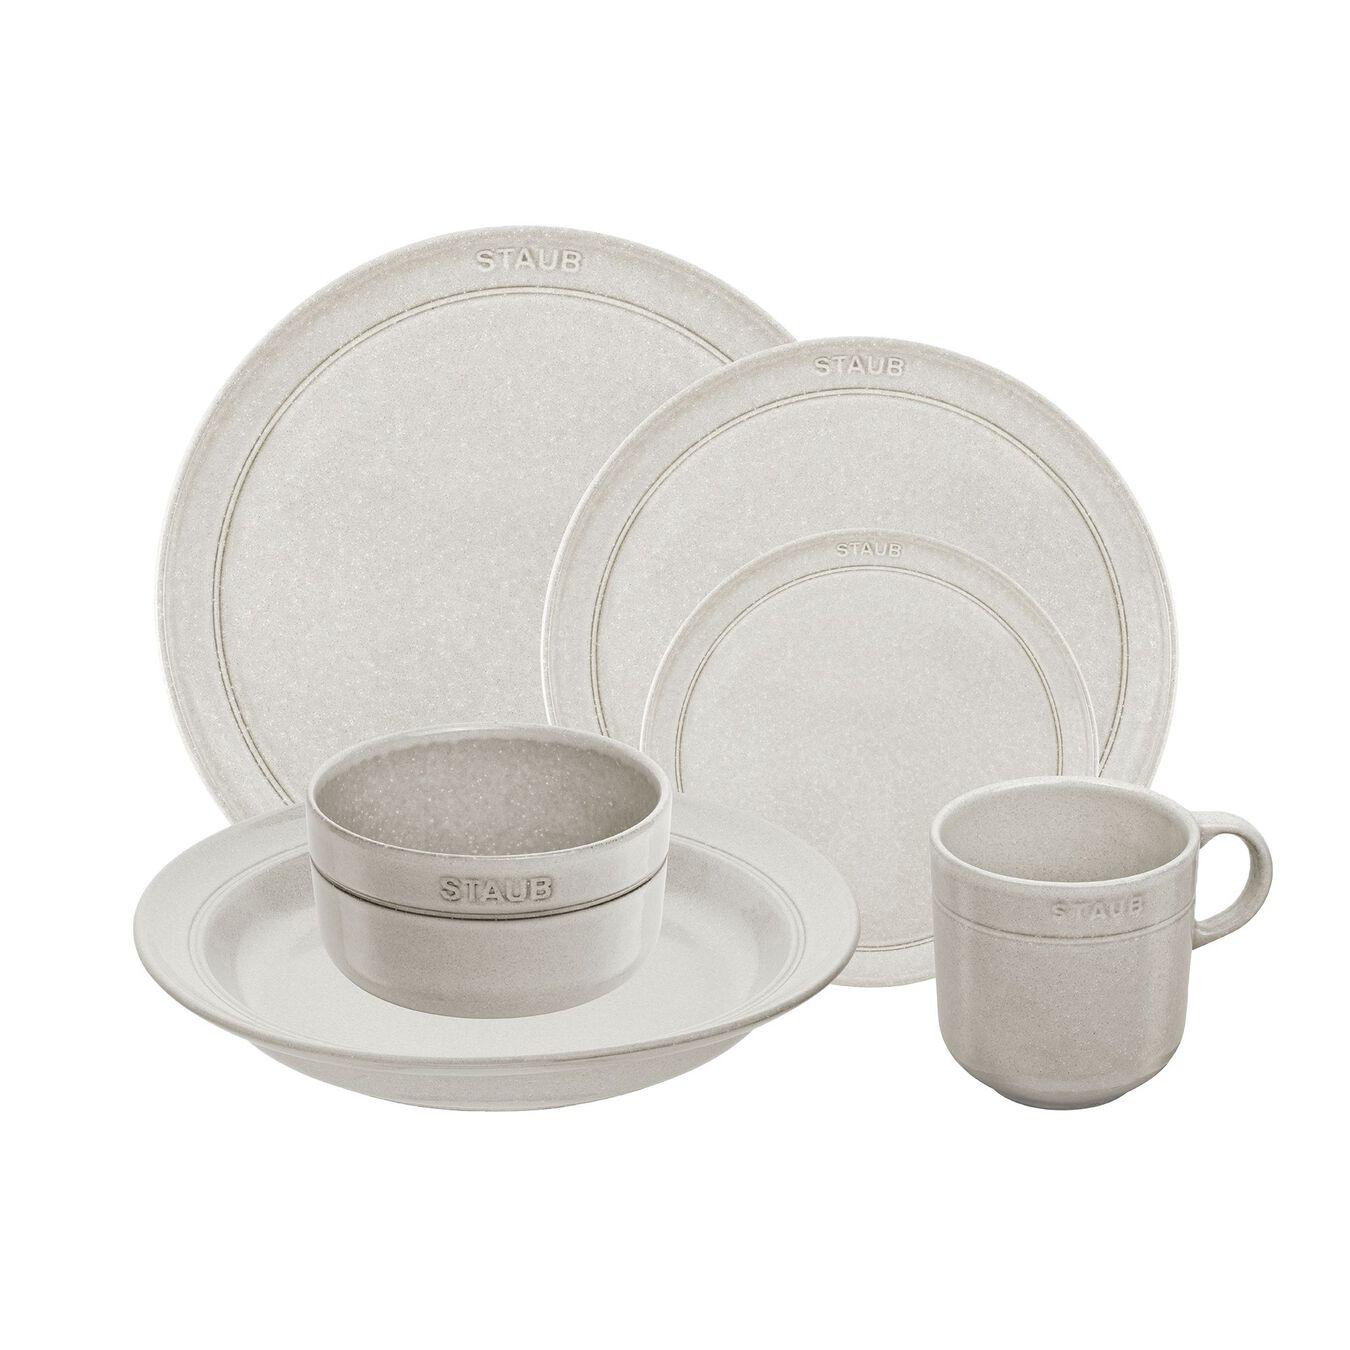 Serving set, 48 Piece   White Truffle   Ceramic   Ceramic,,large 1